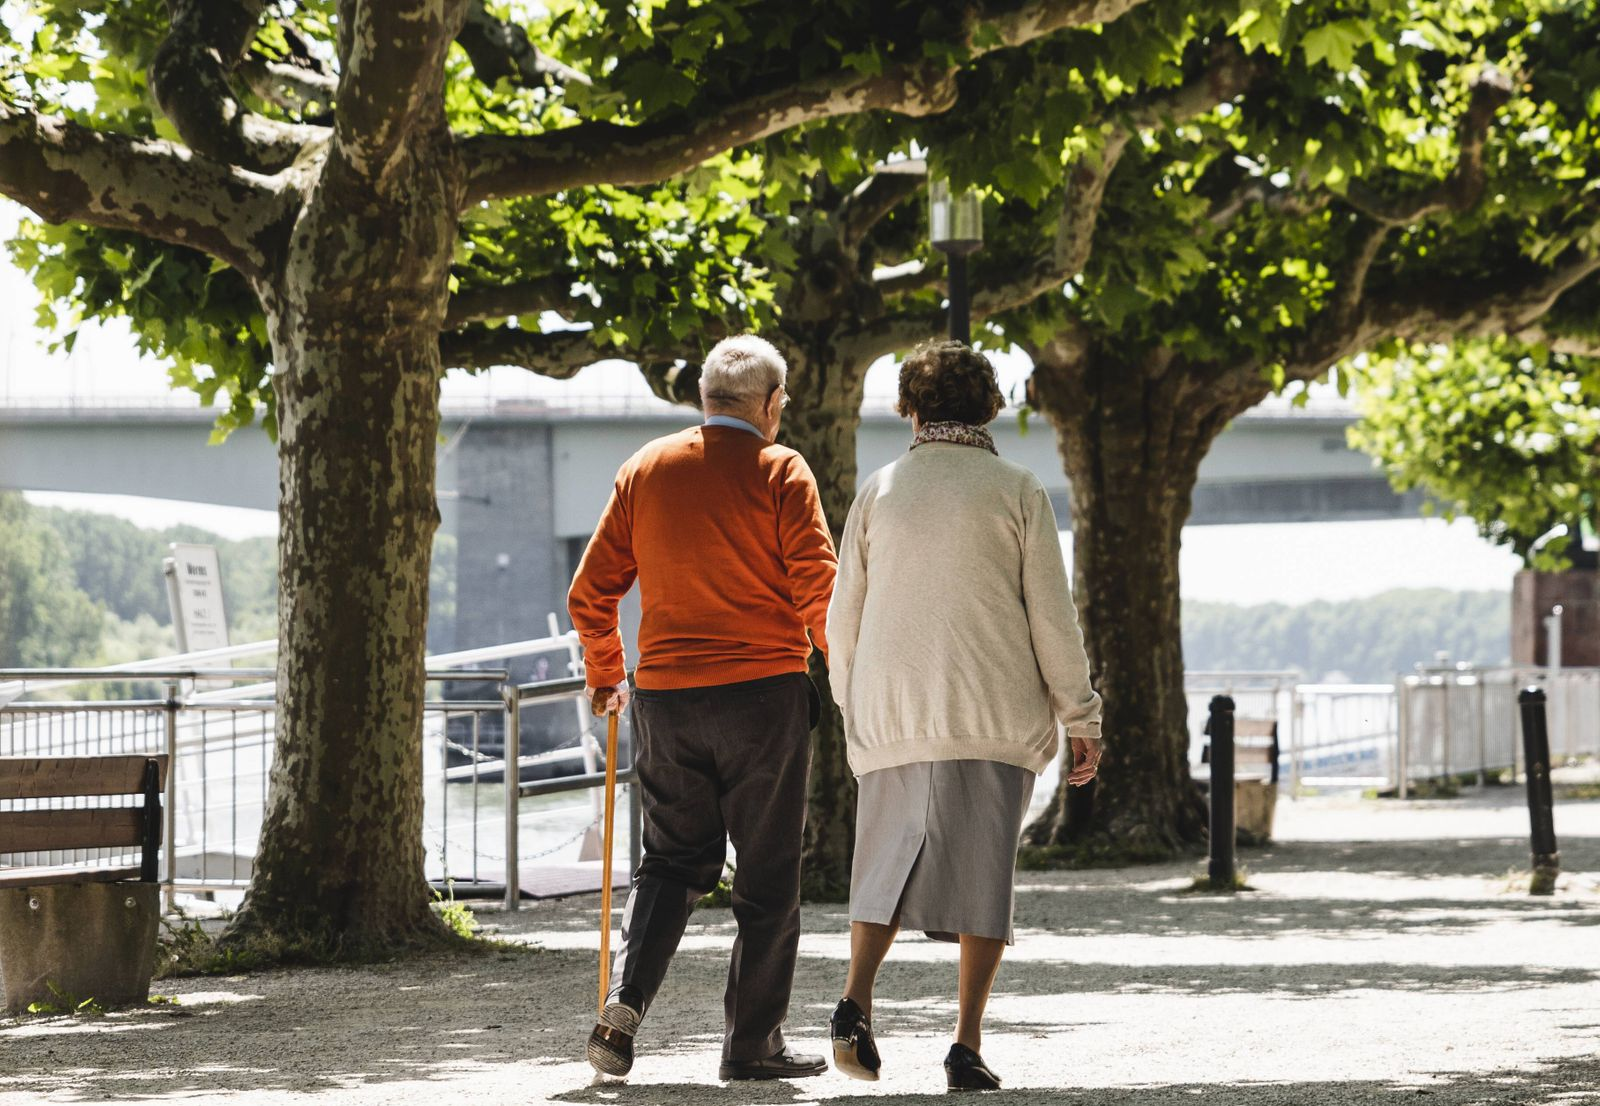 Senior couple walking in park rear view model released Symbolfoto PUBLICATIONxINxGERxSUIxAUTxHUNxON